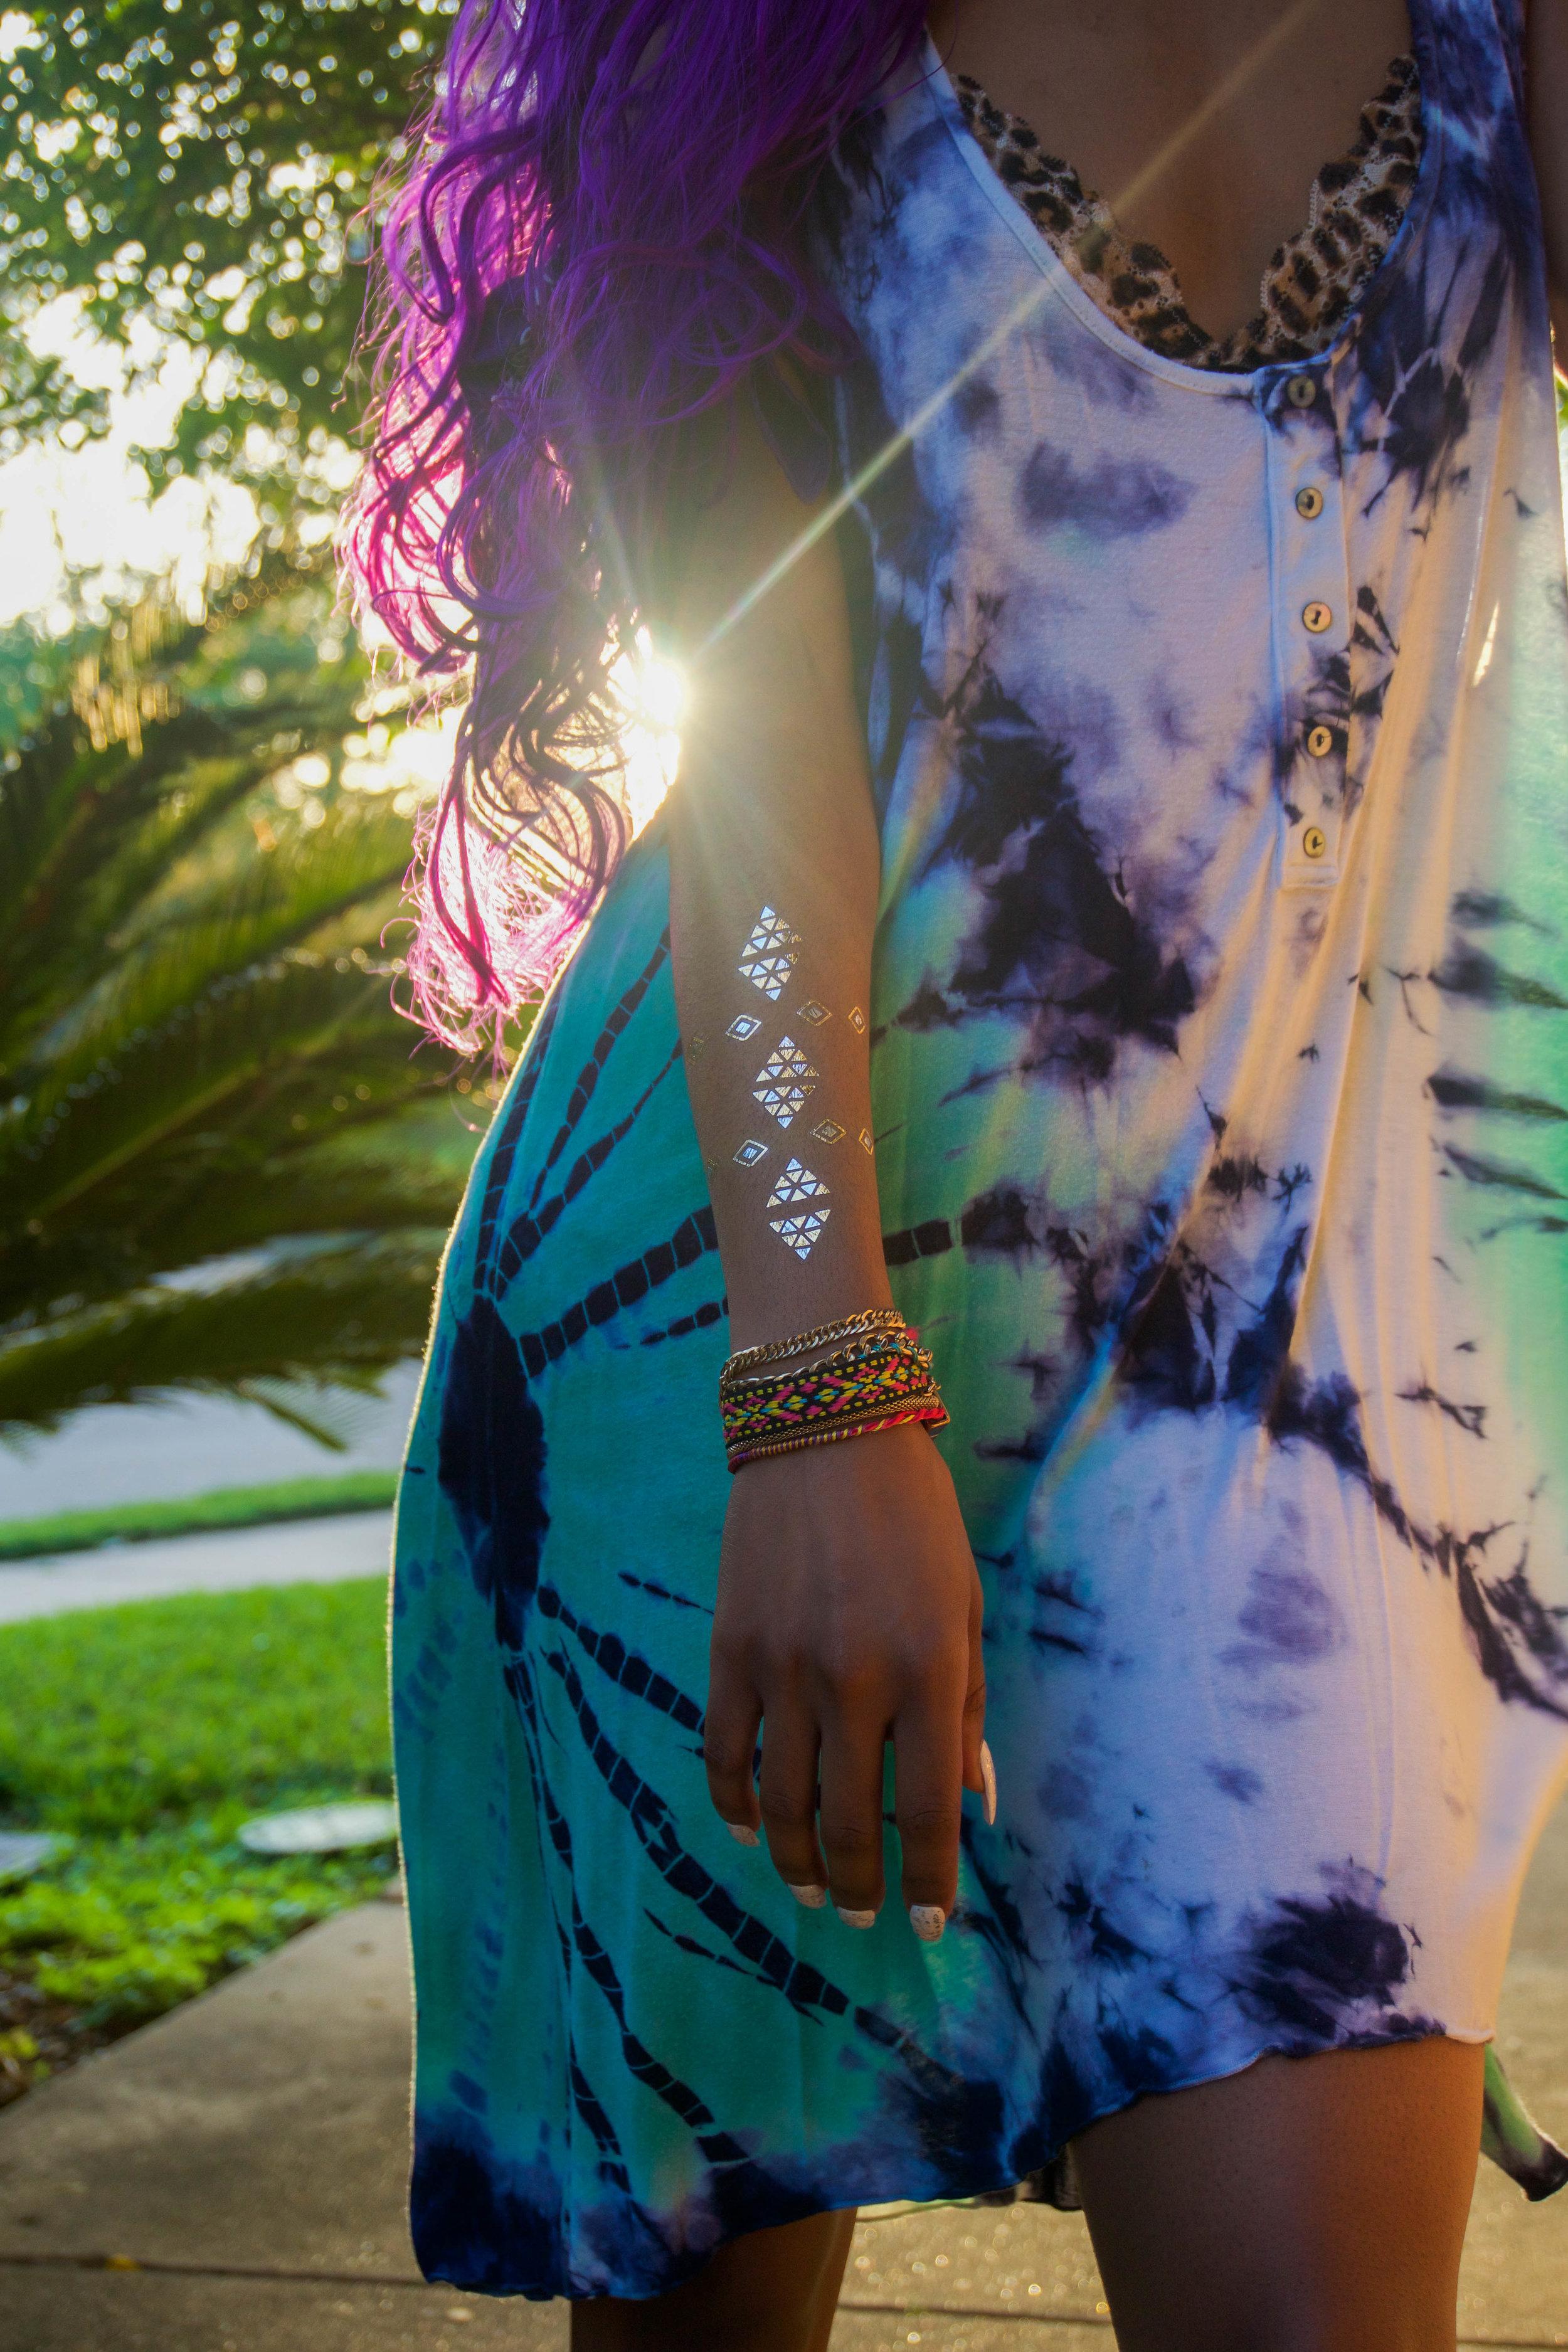 Metallic Flash Tattoo for Coachella Look - Flash Tats and a Tie Dye Dress